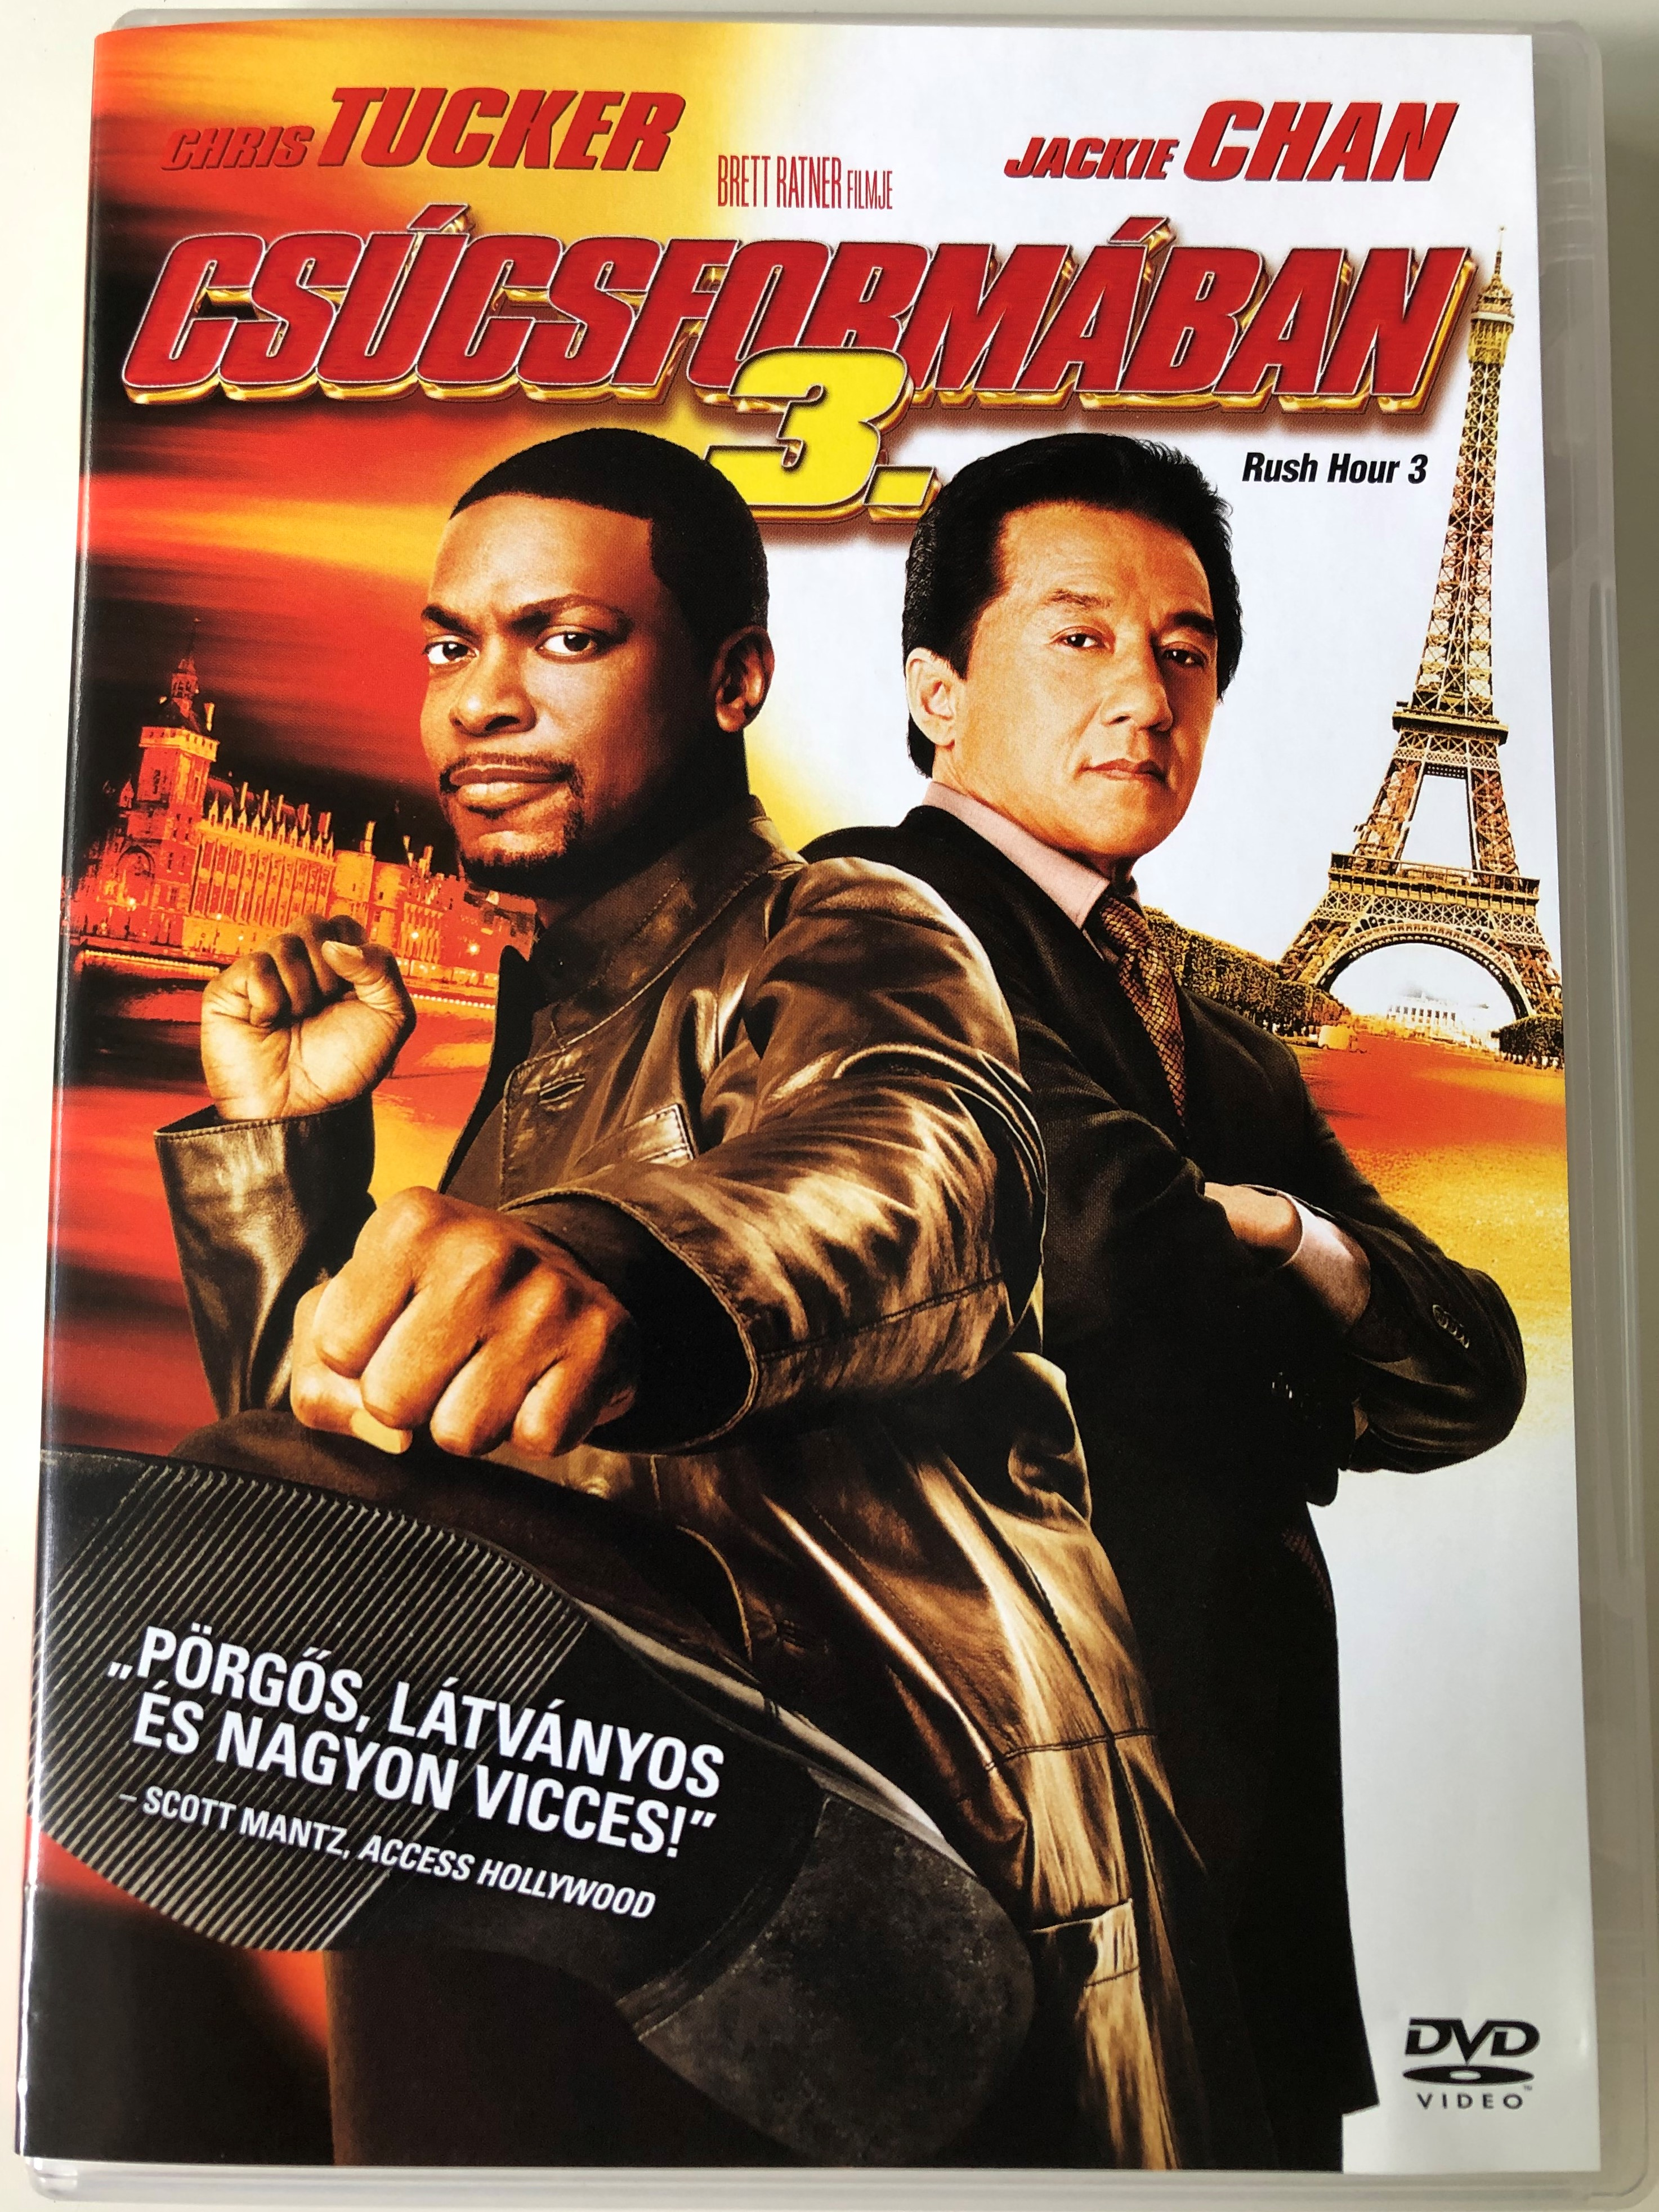 Rush Hour 3 Dvd 2007 Csucsformaban 3 Directed By Brett Ratner Starring Jackie Chan Chris Tucker Hiroyuki Sanada Youki Kudoh Max Von Sydow Bibleinmylanguage